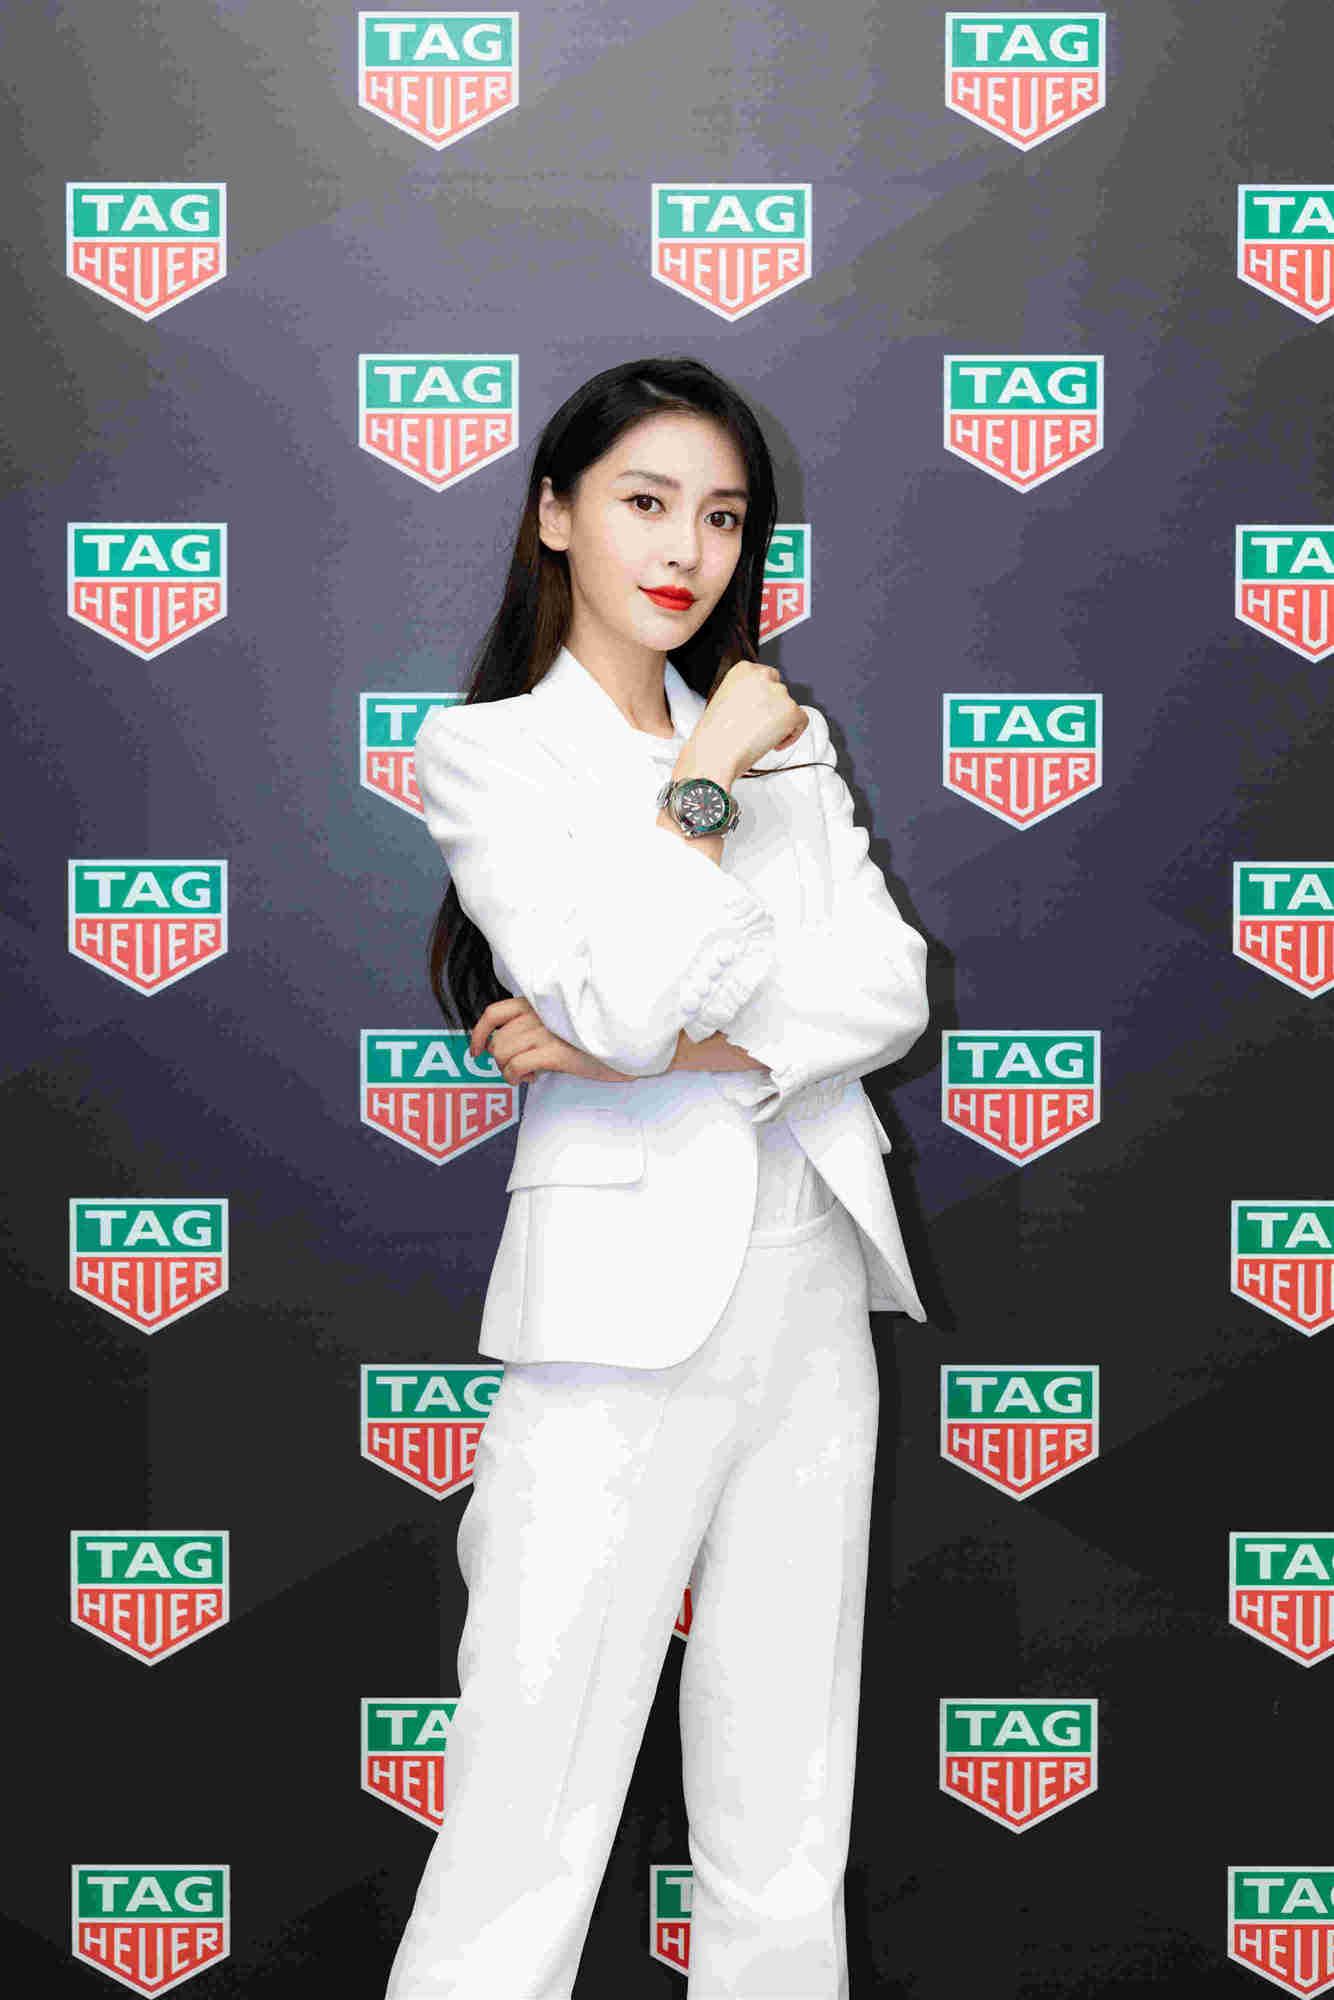 TAG Heuer泰格豪雅携手全球品牌大使Angelababy 亮相2019赛季中国足球协会超级联赛开幕式